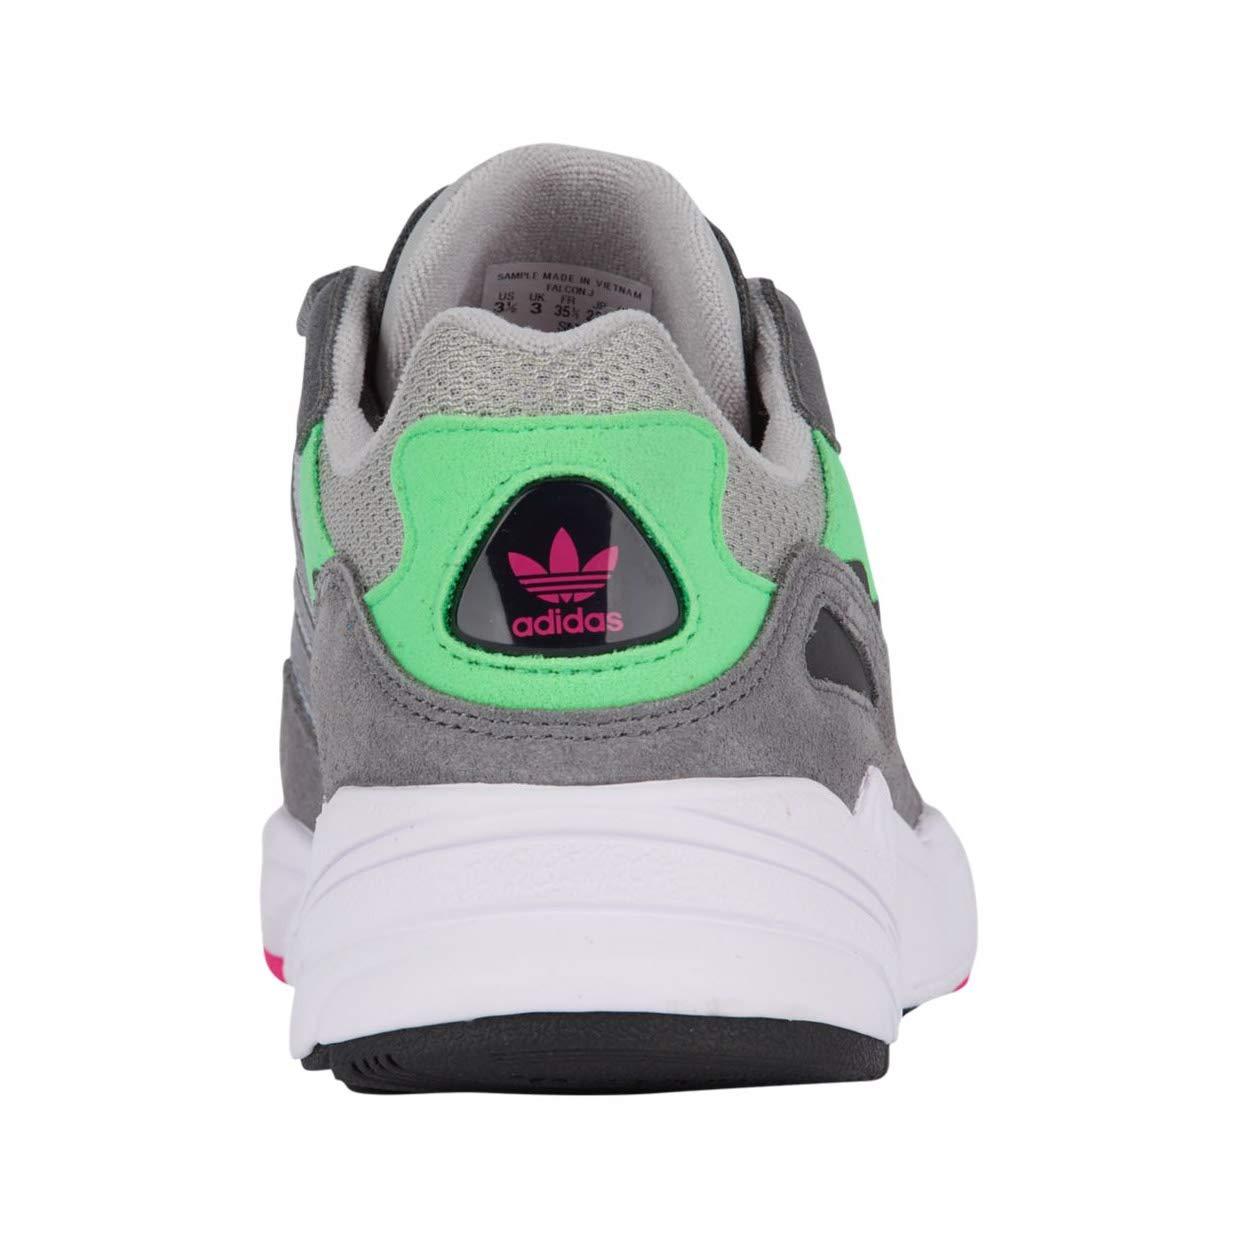 super popular 89b90 dbf01 Amazon.com   adidas Originals Kids Yung-96 Sneakers, Grey Grey Shock Pink  3.5M   Sneakers